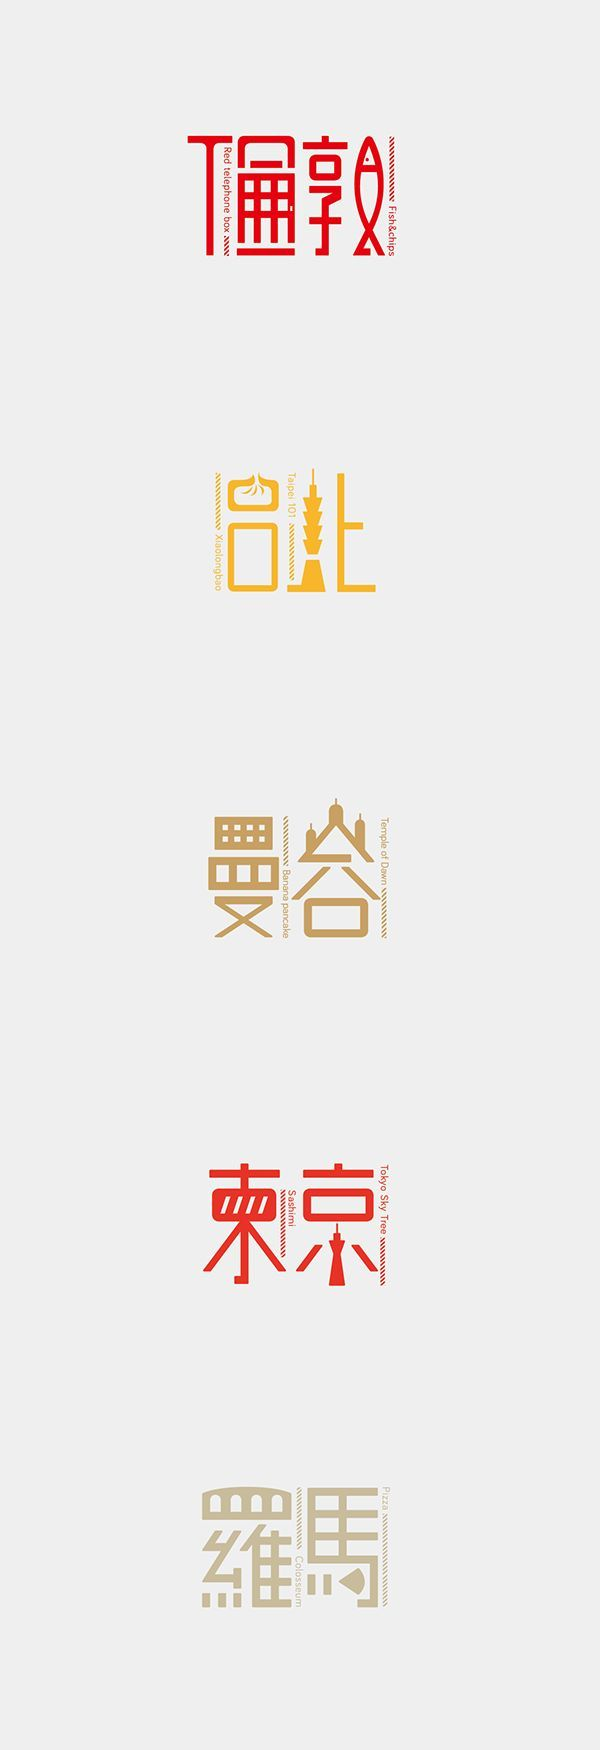 #Chinese characters: 倫敦 London 曼谷Bangkok 東京 Tokyo 羅馬 Rome